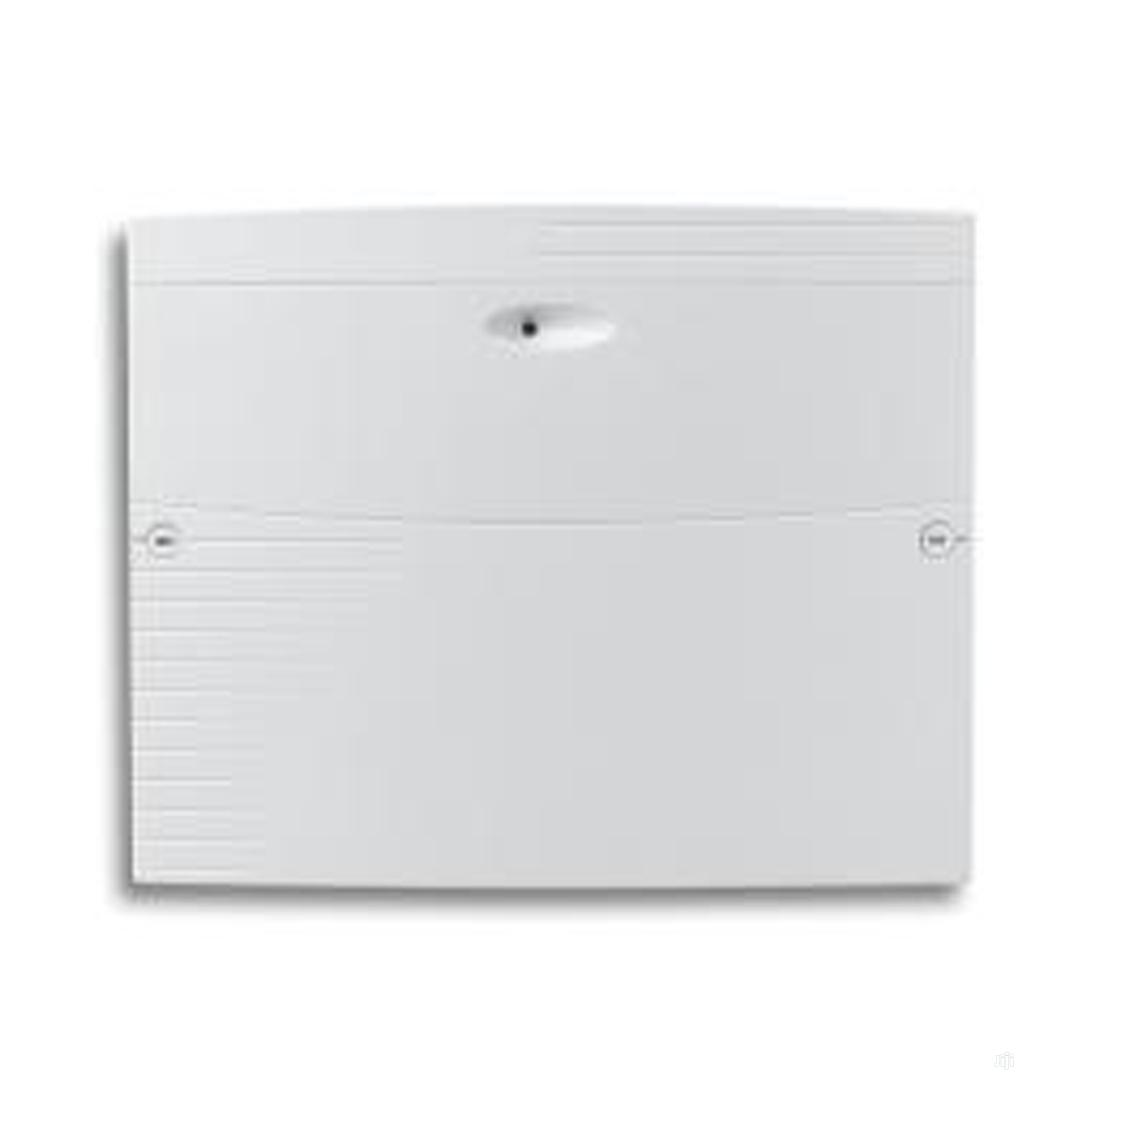 Archive: Burglary Alarm System - Texacom Premier Elite 24